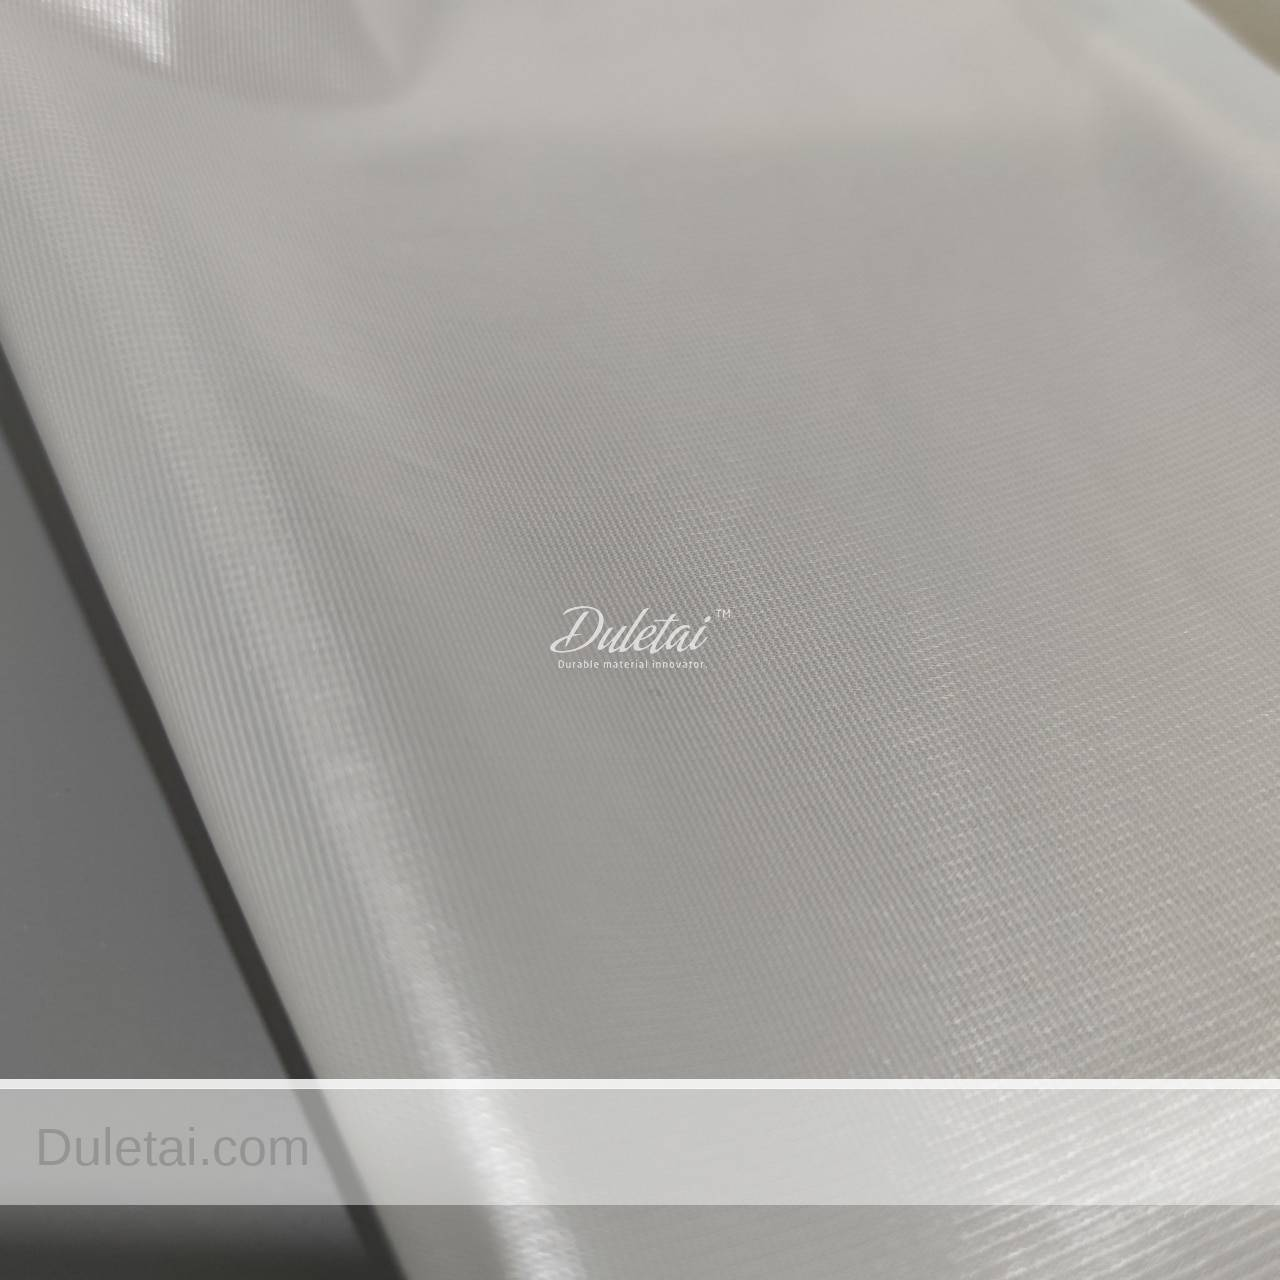 Breathable TPU fabric